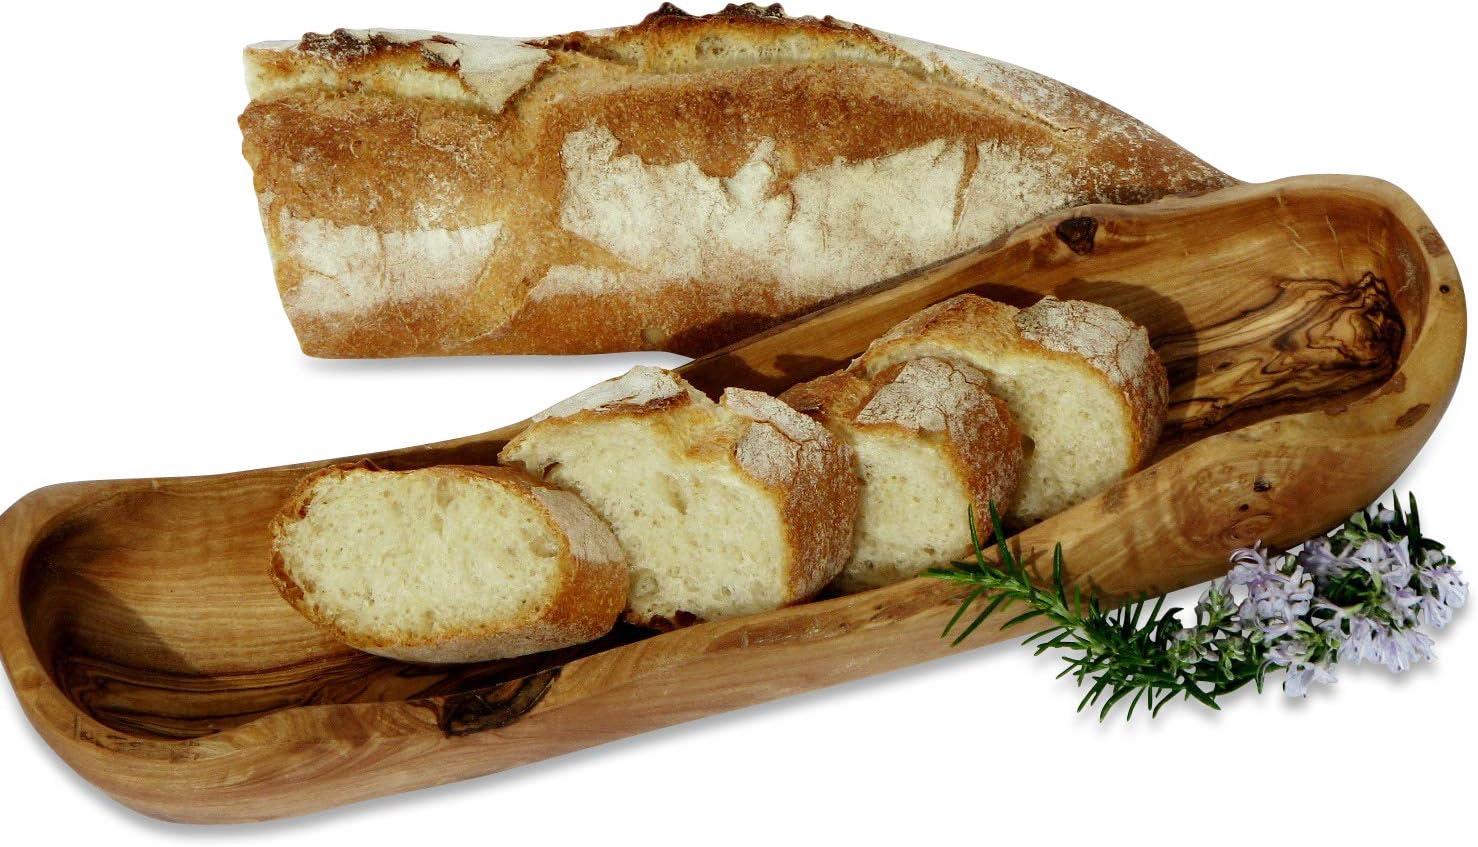 30 cm Brotkorb Brotkasten Echtholz Brot Korb Design Olivenholz Brotschale ca